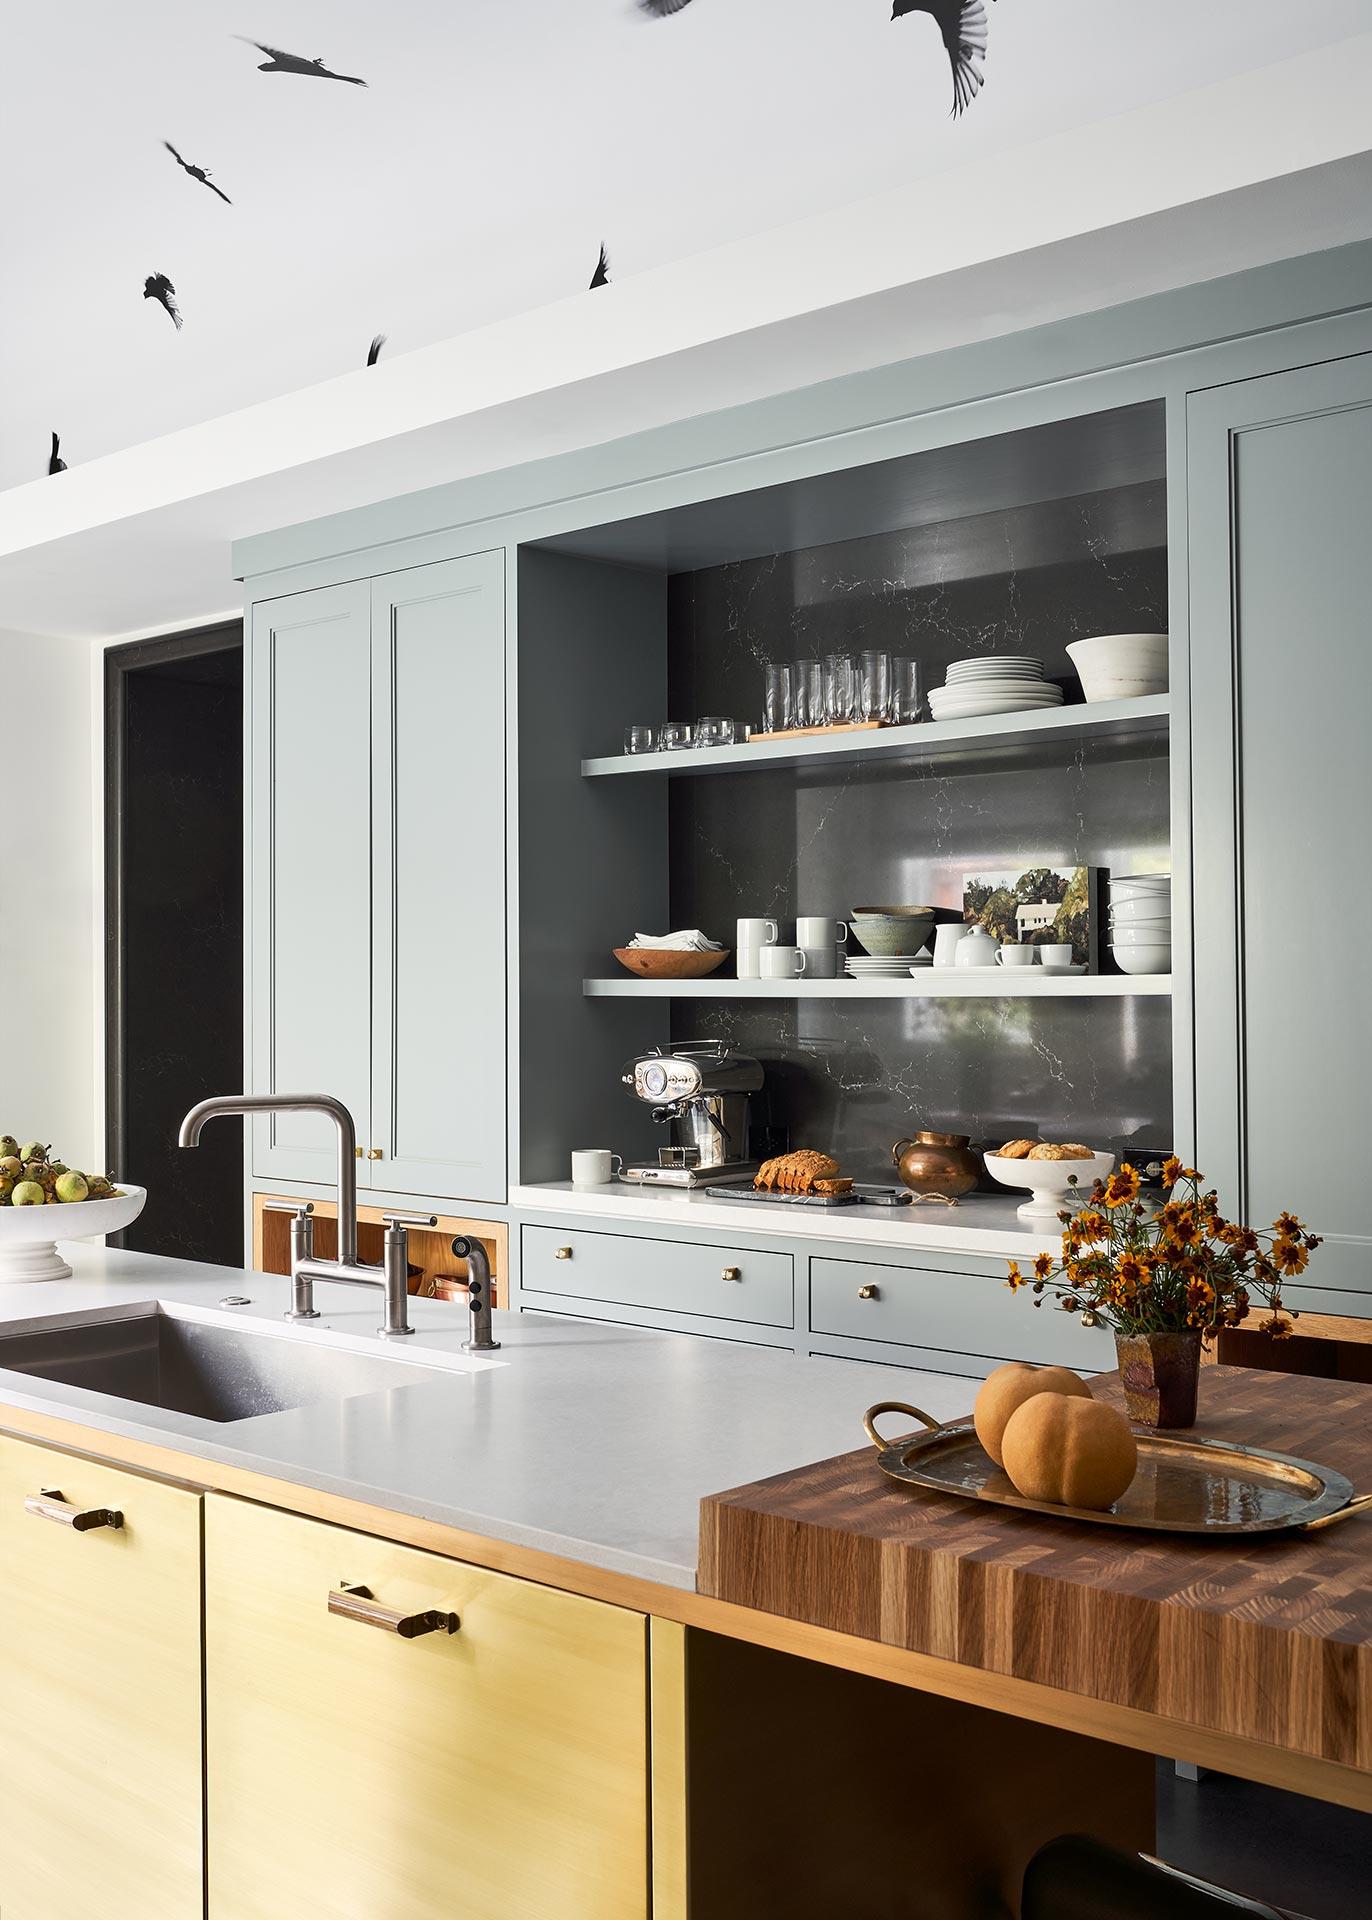 Kitchen Design Photos And Ideas